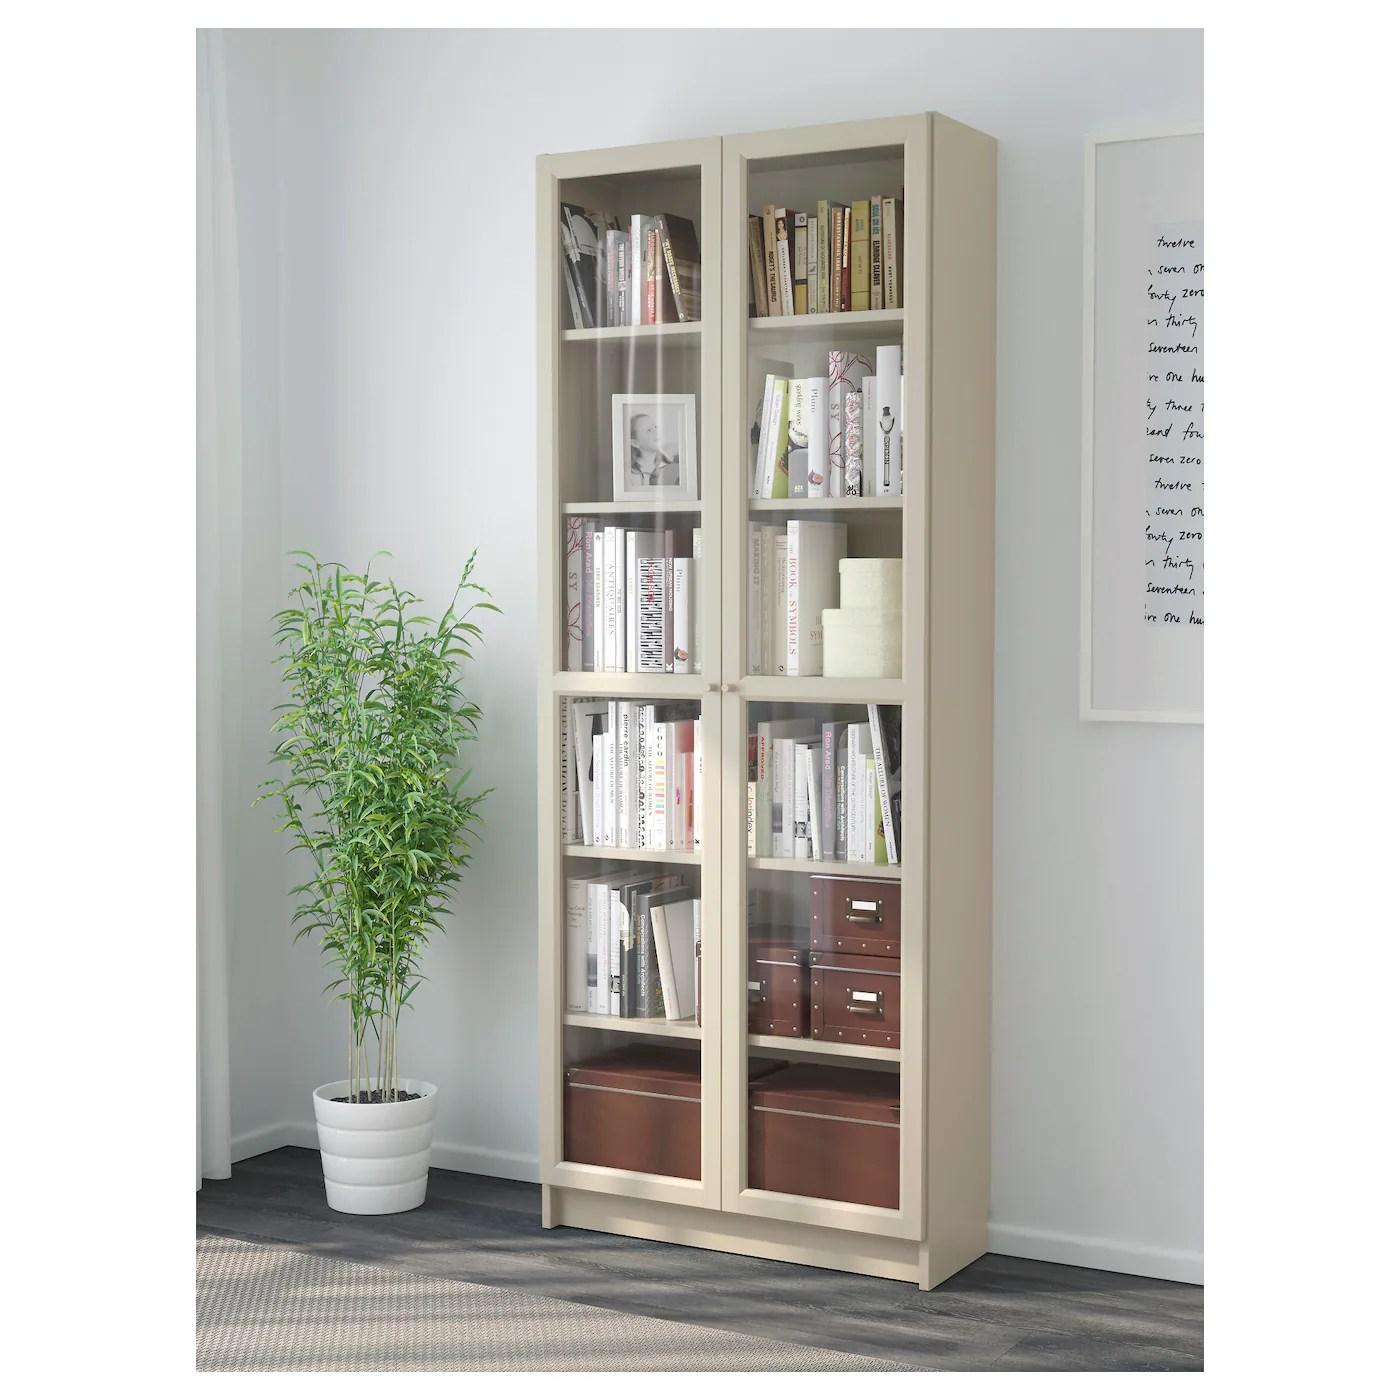 Billy Bookcase With Doors Beige 80x30x202 Cm Ikea